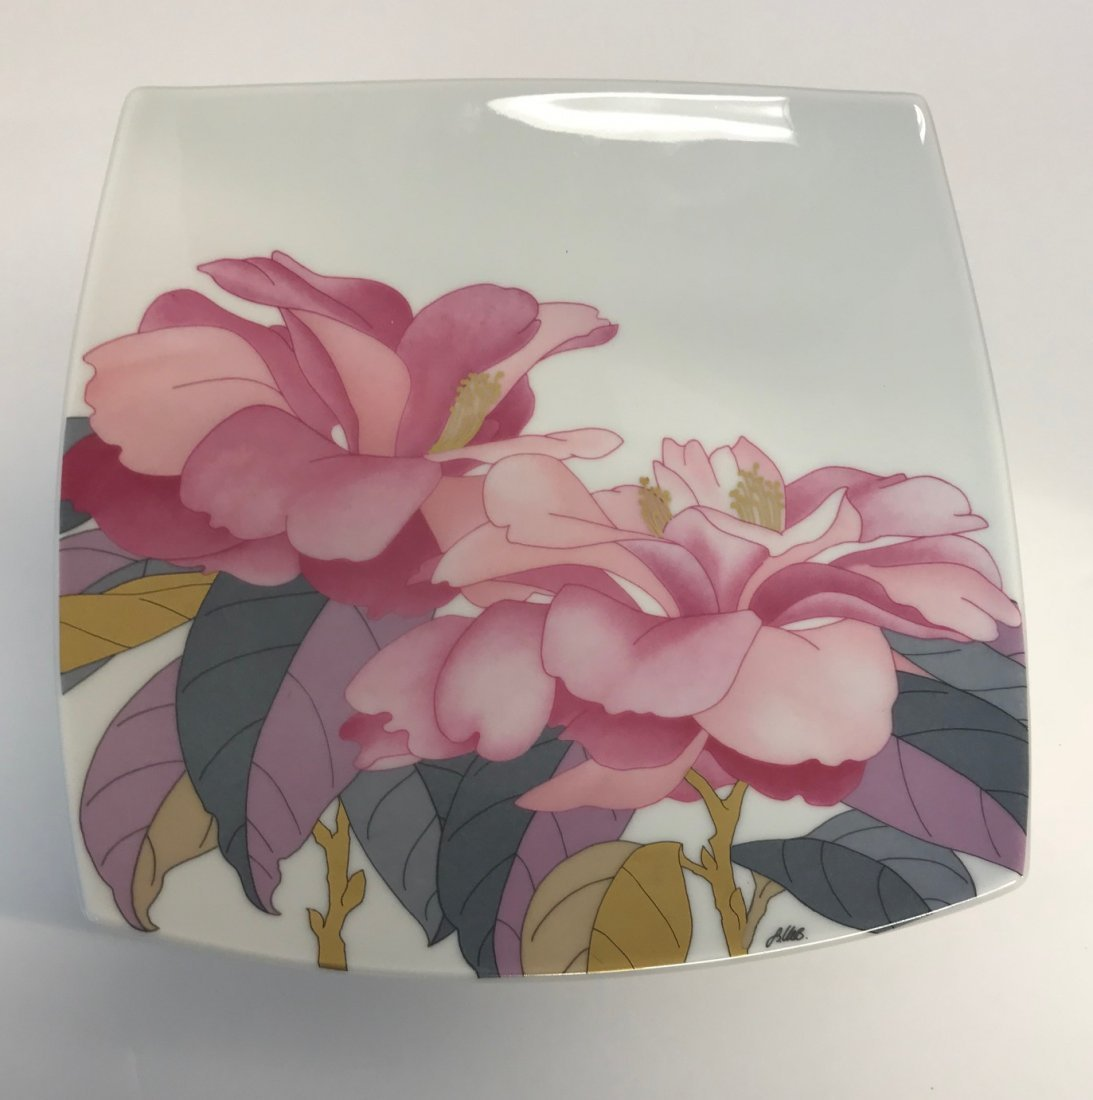 Rosenthal Studio-Linie floral Dish